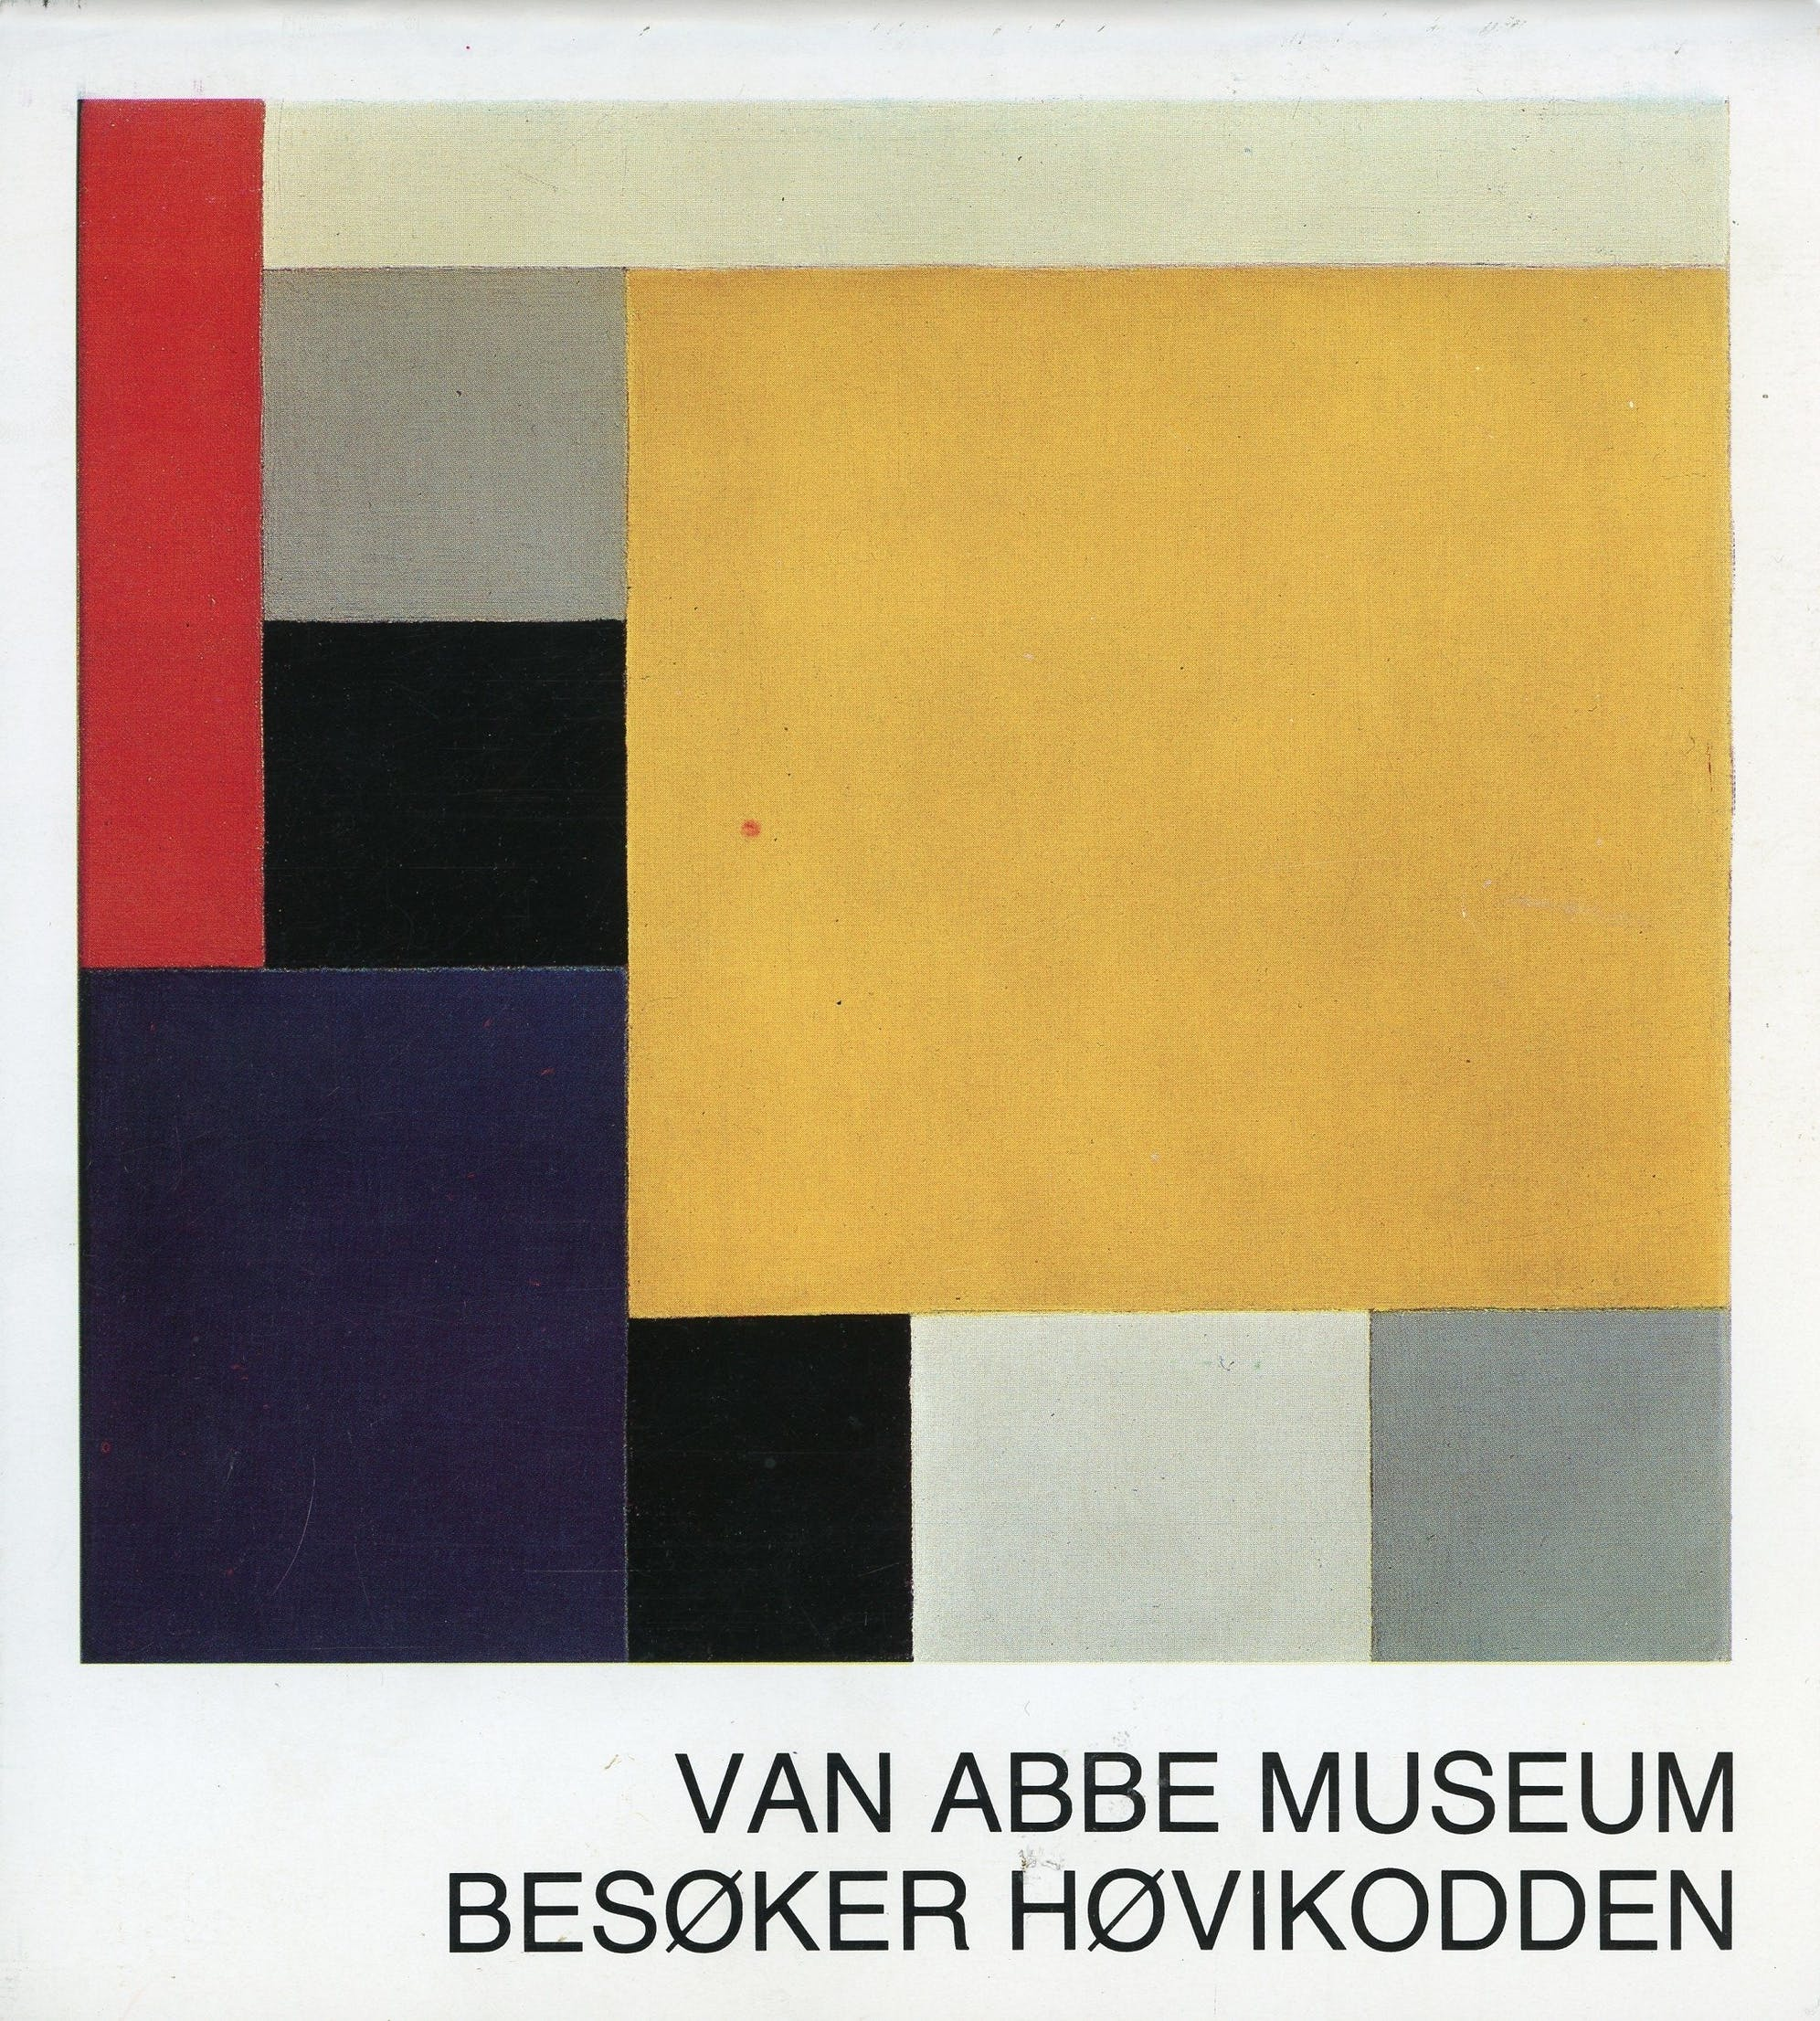 Vanabbe002